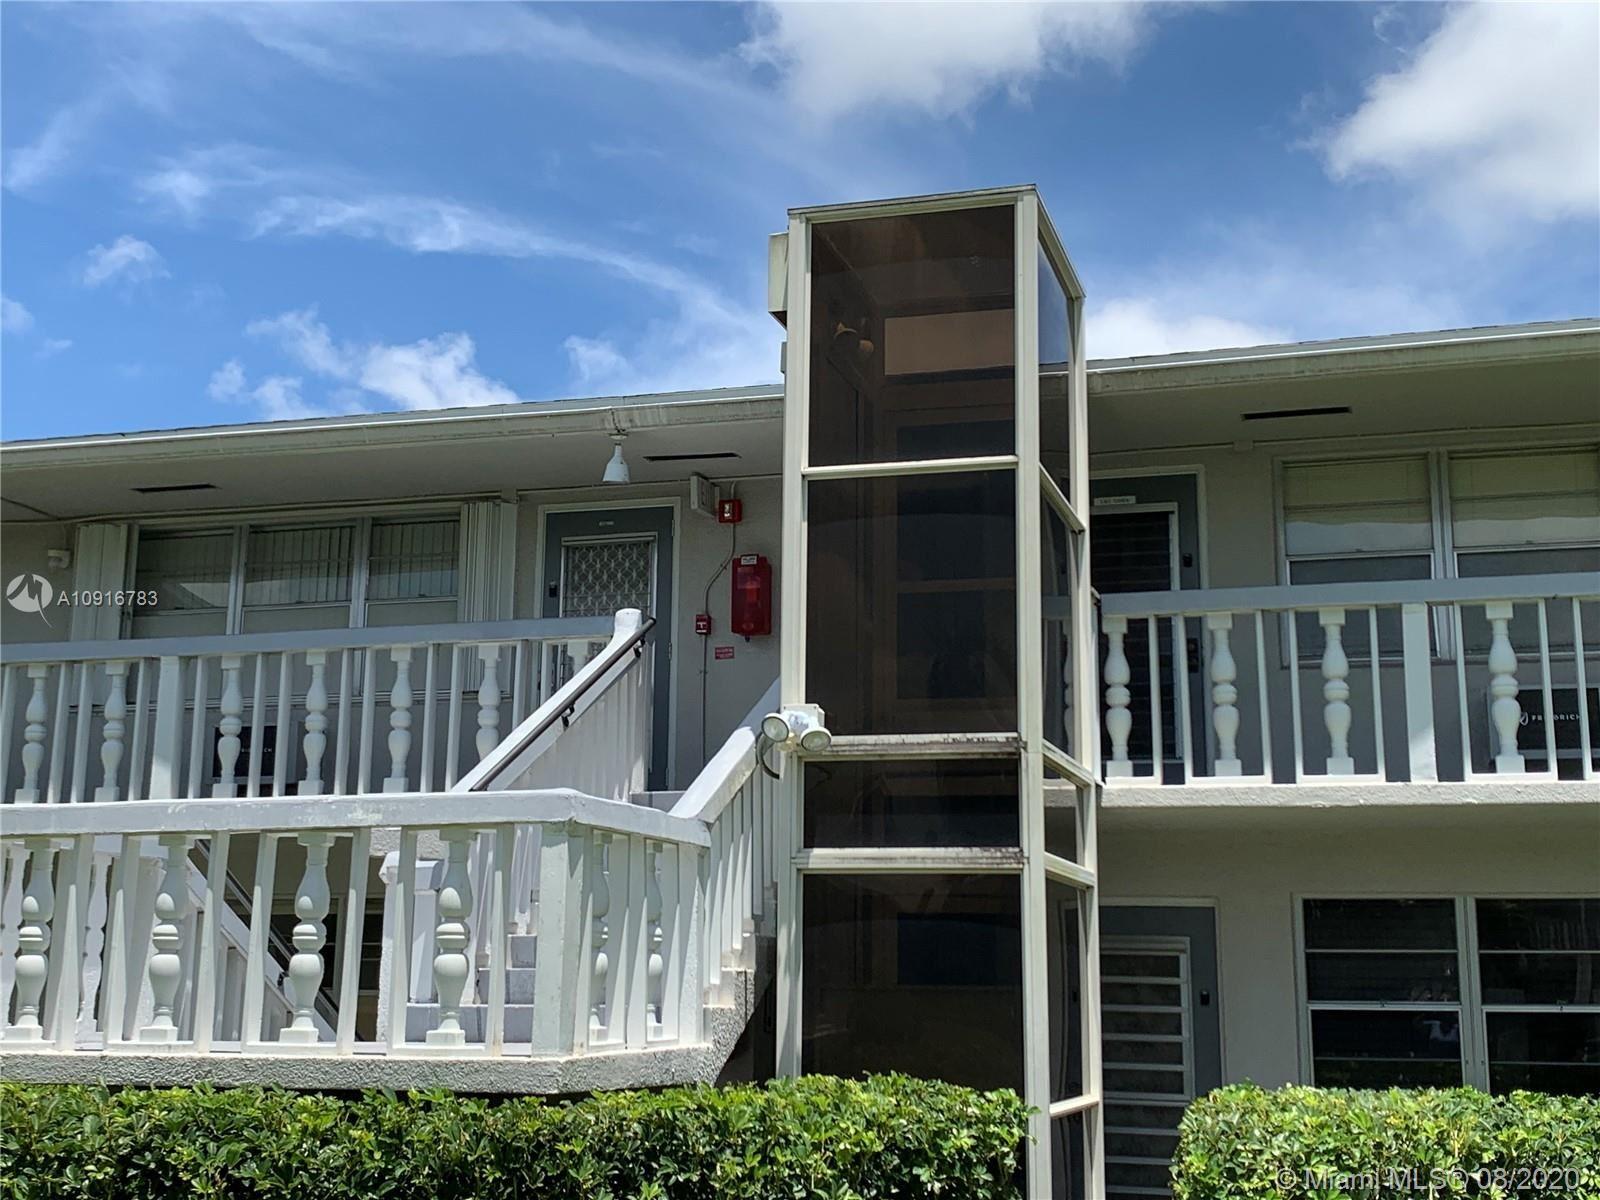 209 Farnham I #209, Deerfield Beach, FL 33442 - #: A10916783